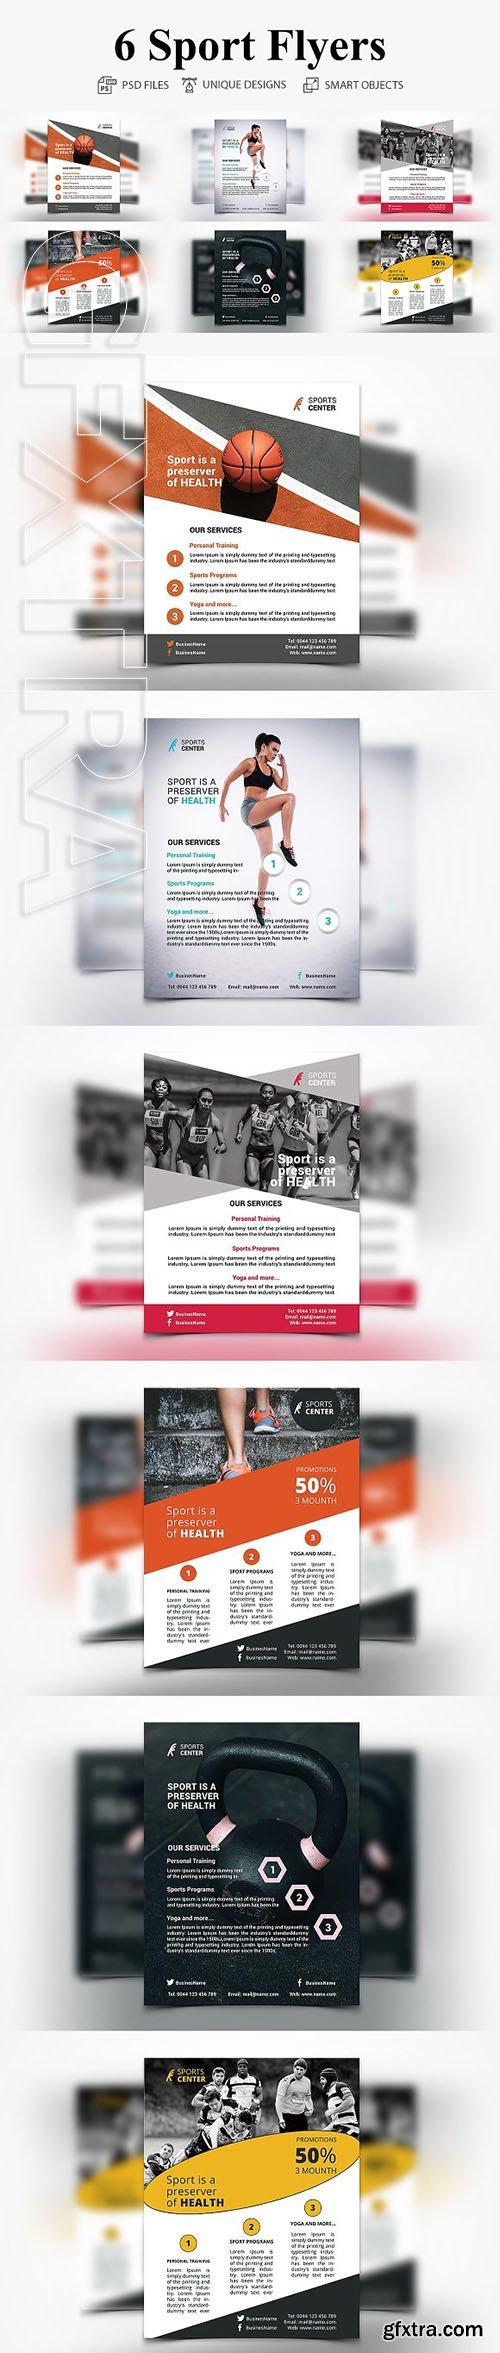 CreativeMarket - 6 Sport Flyers 2793216